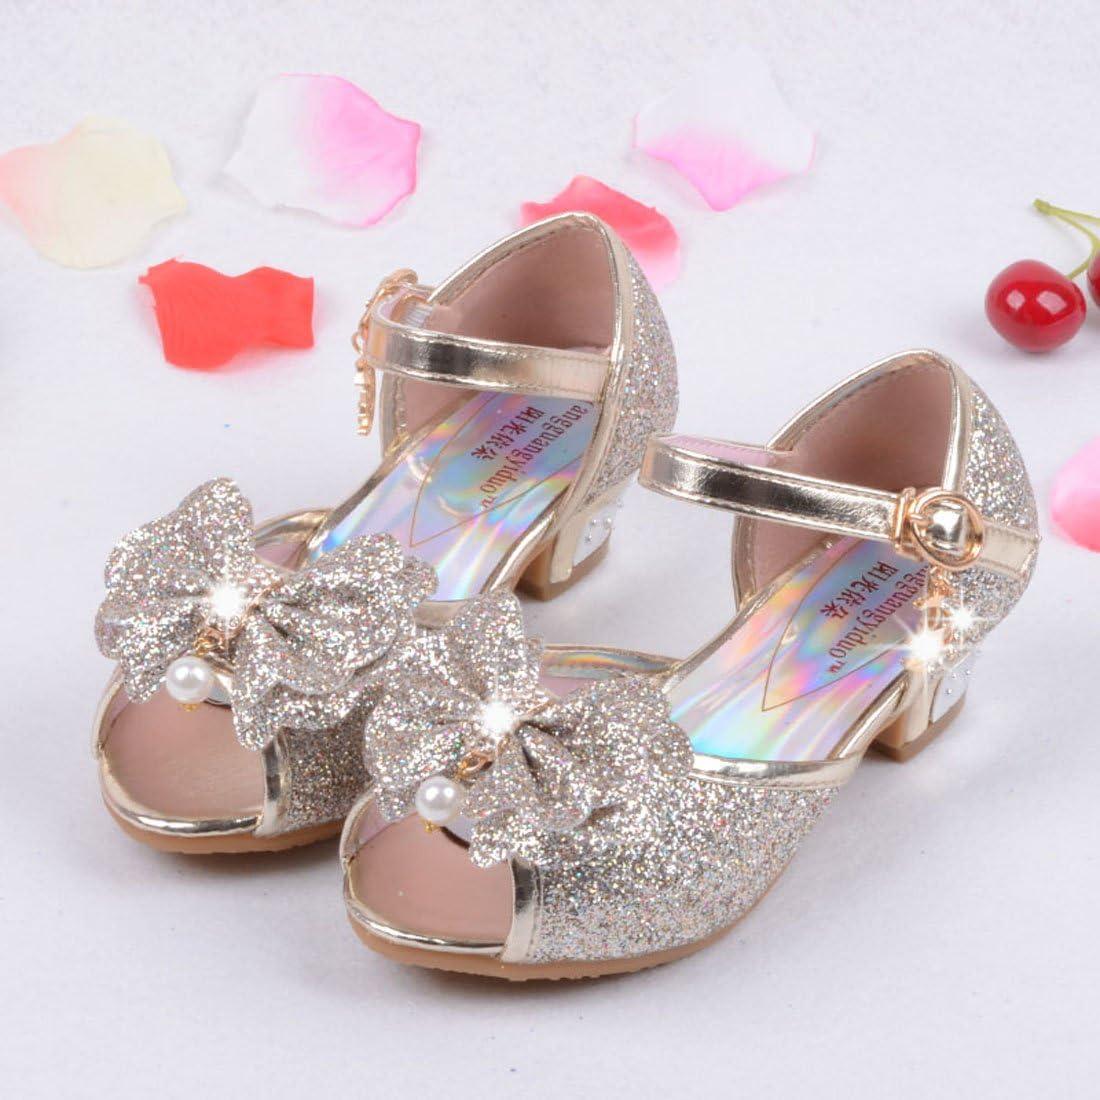 ON Girls Kids Children Glitter Evening Wedding Party Low Heel Open Toe Sandal Shoes Mary Jane